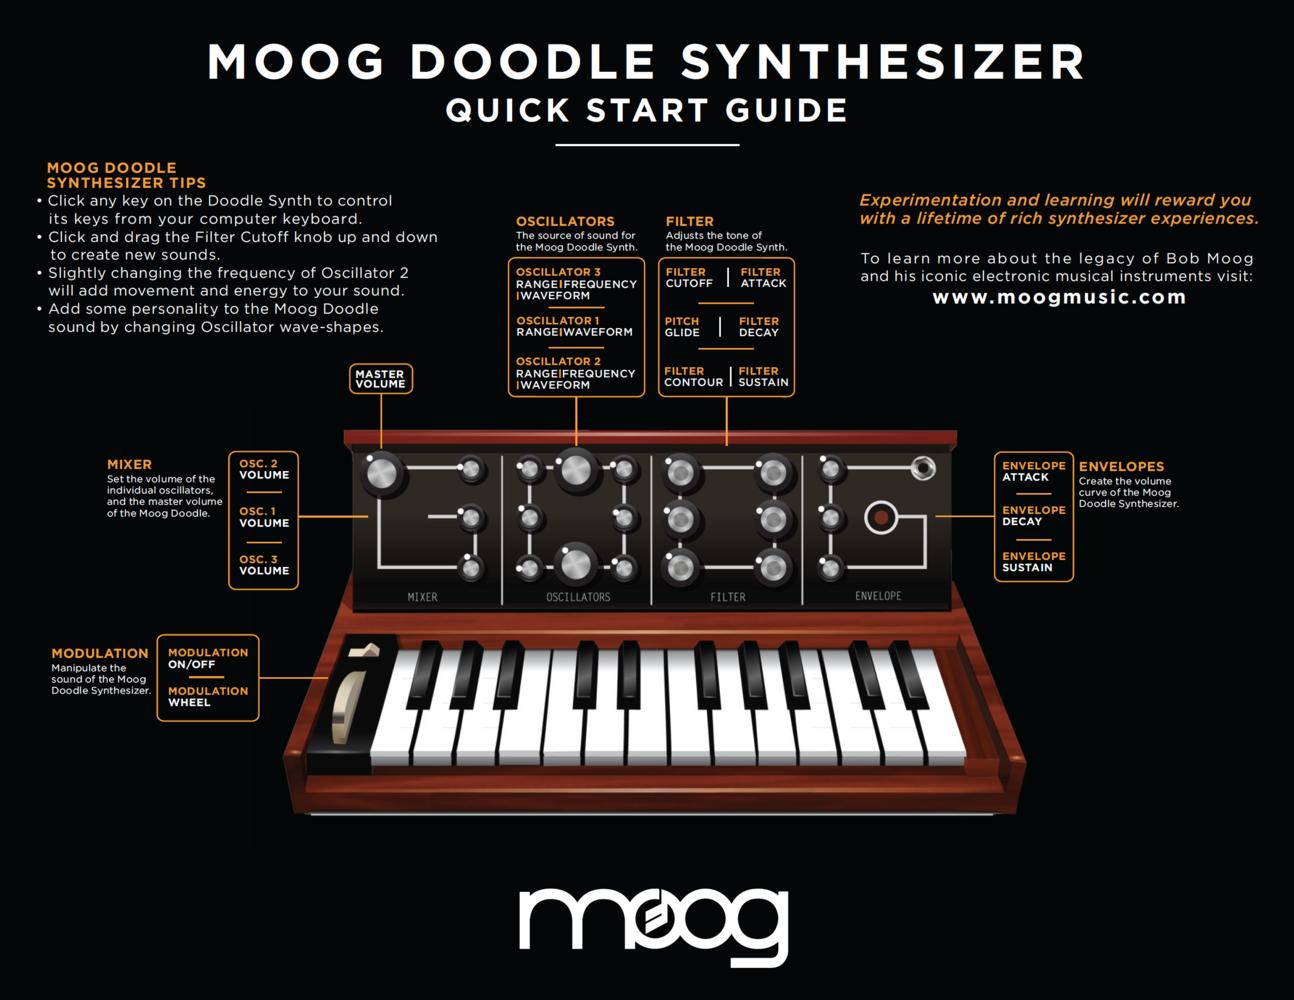 Google honours robert moog's birthday with minimoog synth emulator.